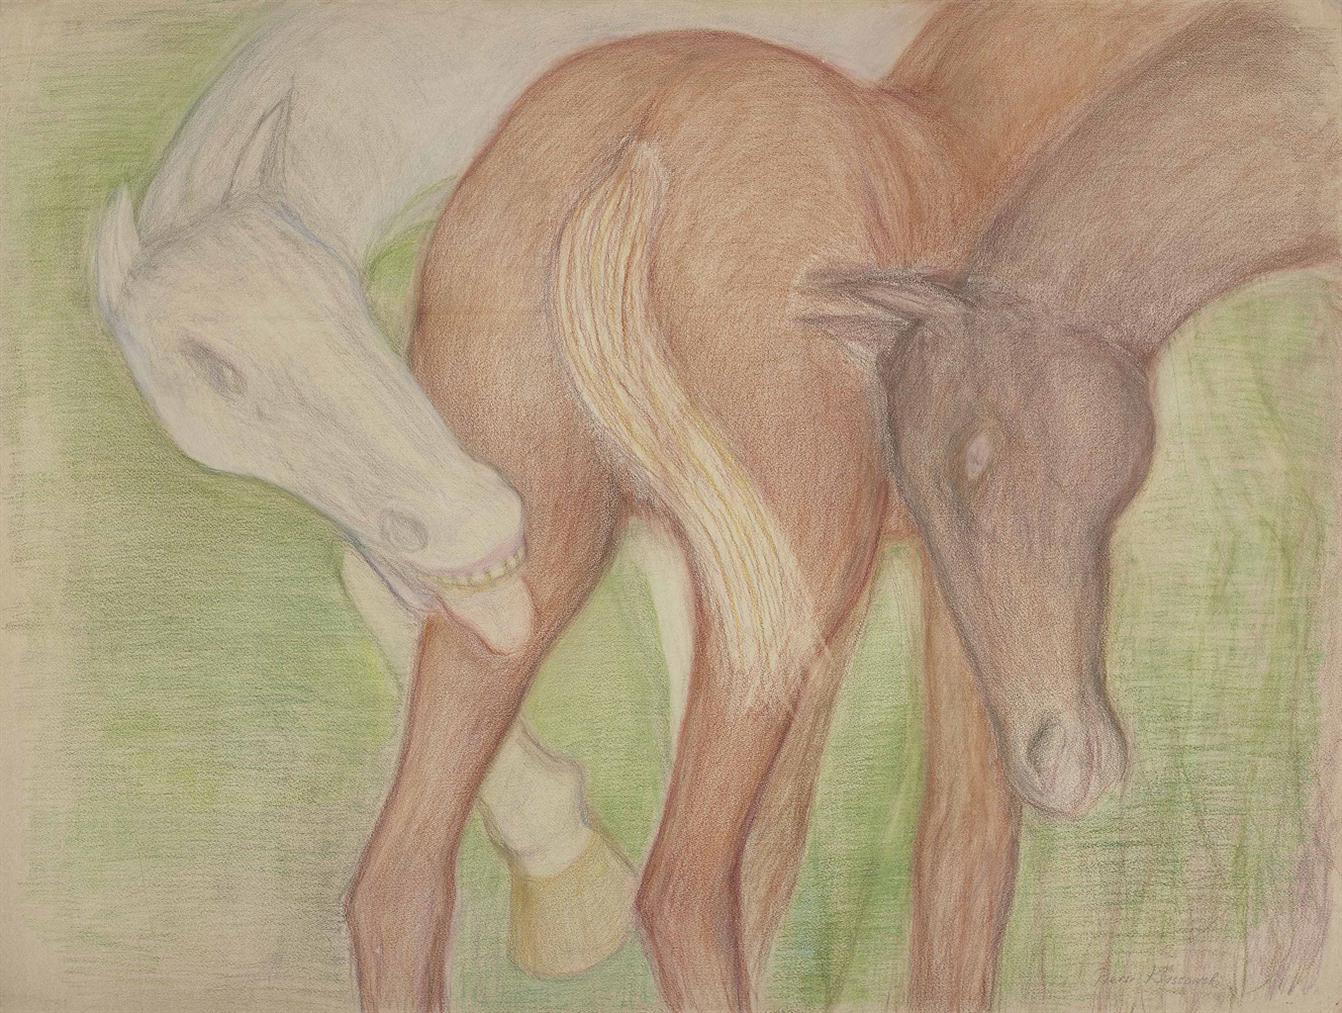 Pierre Klossowski-Bayard, Turcade, Elise-1973